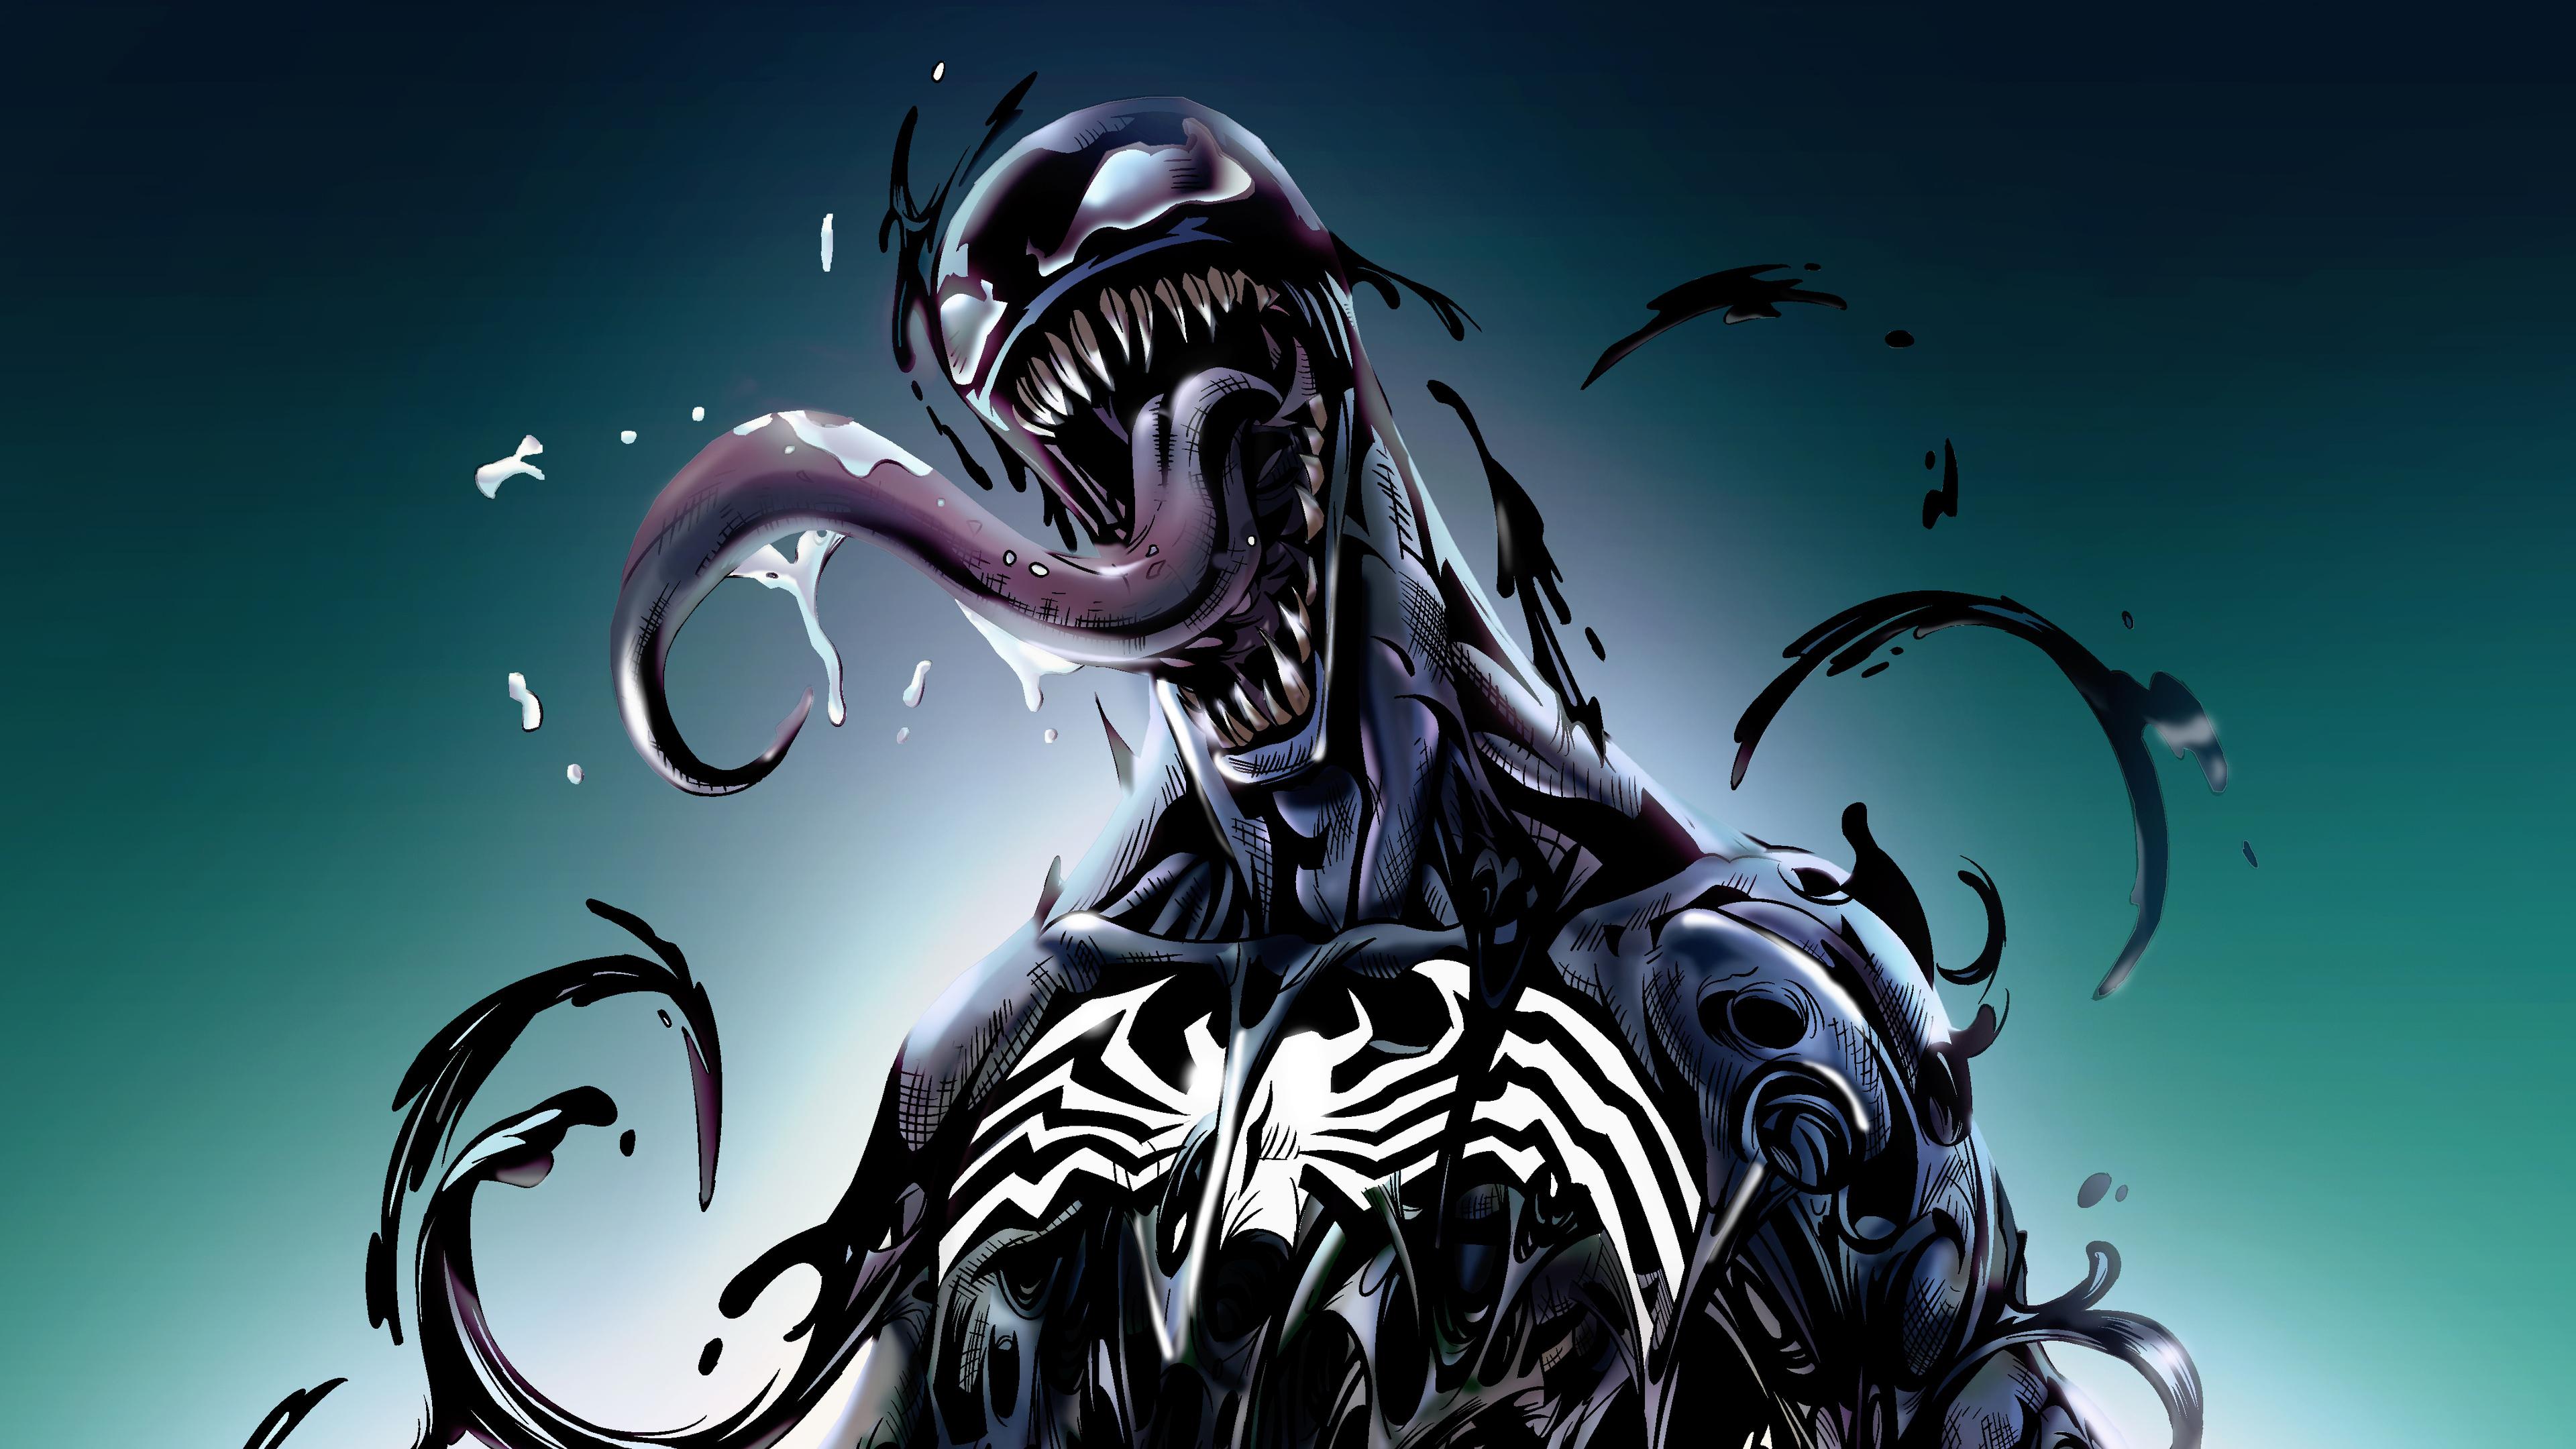 4k spiderman vs venom 1562105489 - 4k Spiderman Vs Venom - Venom wallpapers, superheroes wallpapers, spiderman wallpapers, hd-wallpapers, digital art wallpapers, artwork wallpapers, artist wallpapers, 4k-wallpapers